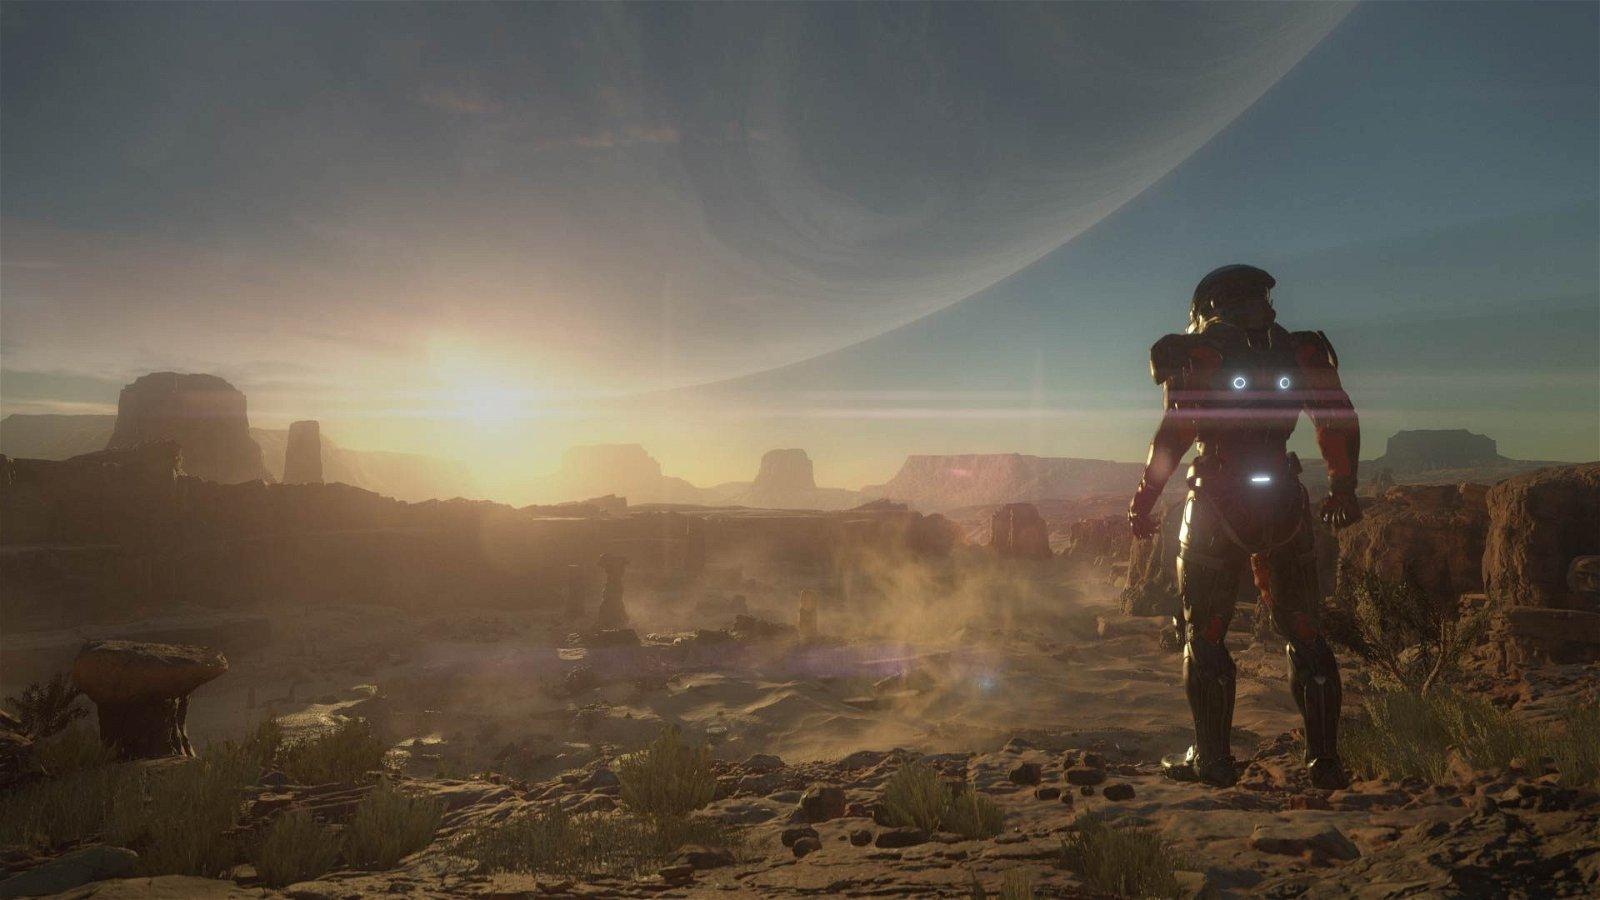 EA Confirms Mass Effect Andromeda Not Coming Until Q1 2017